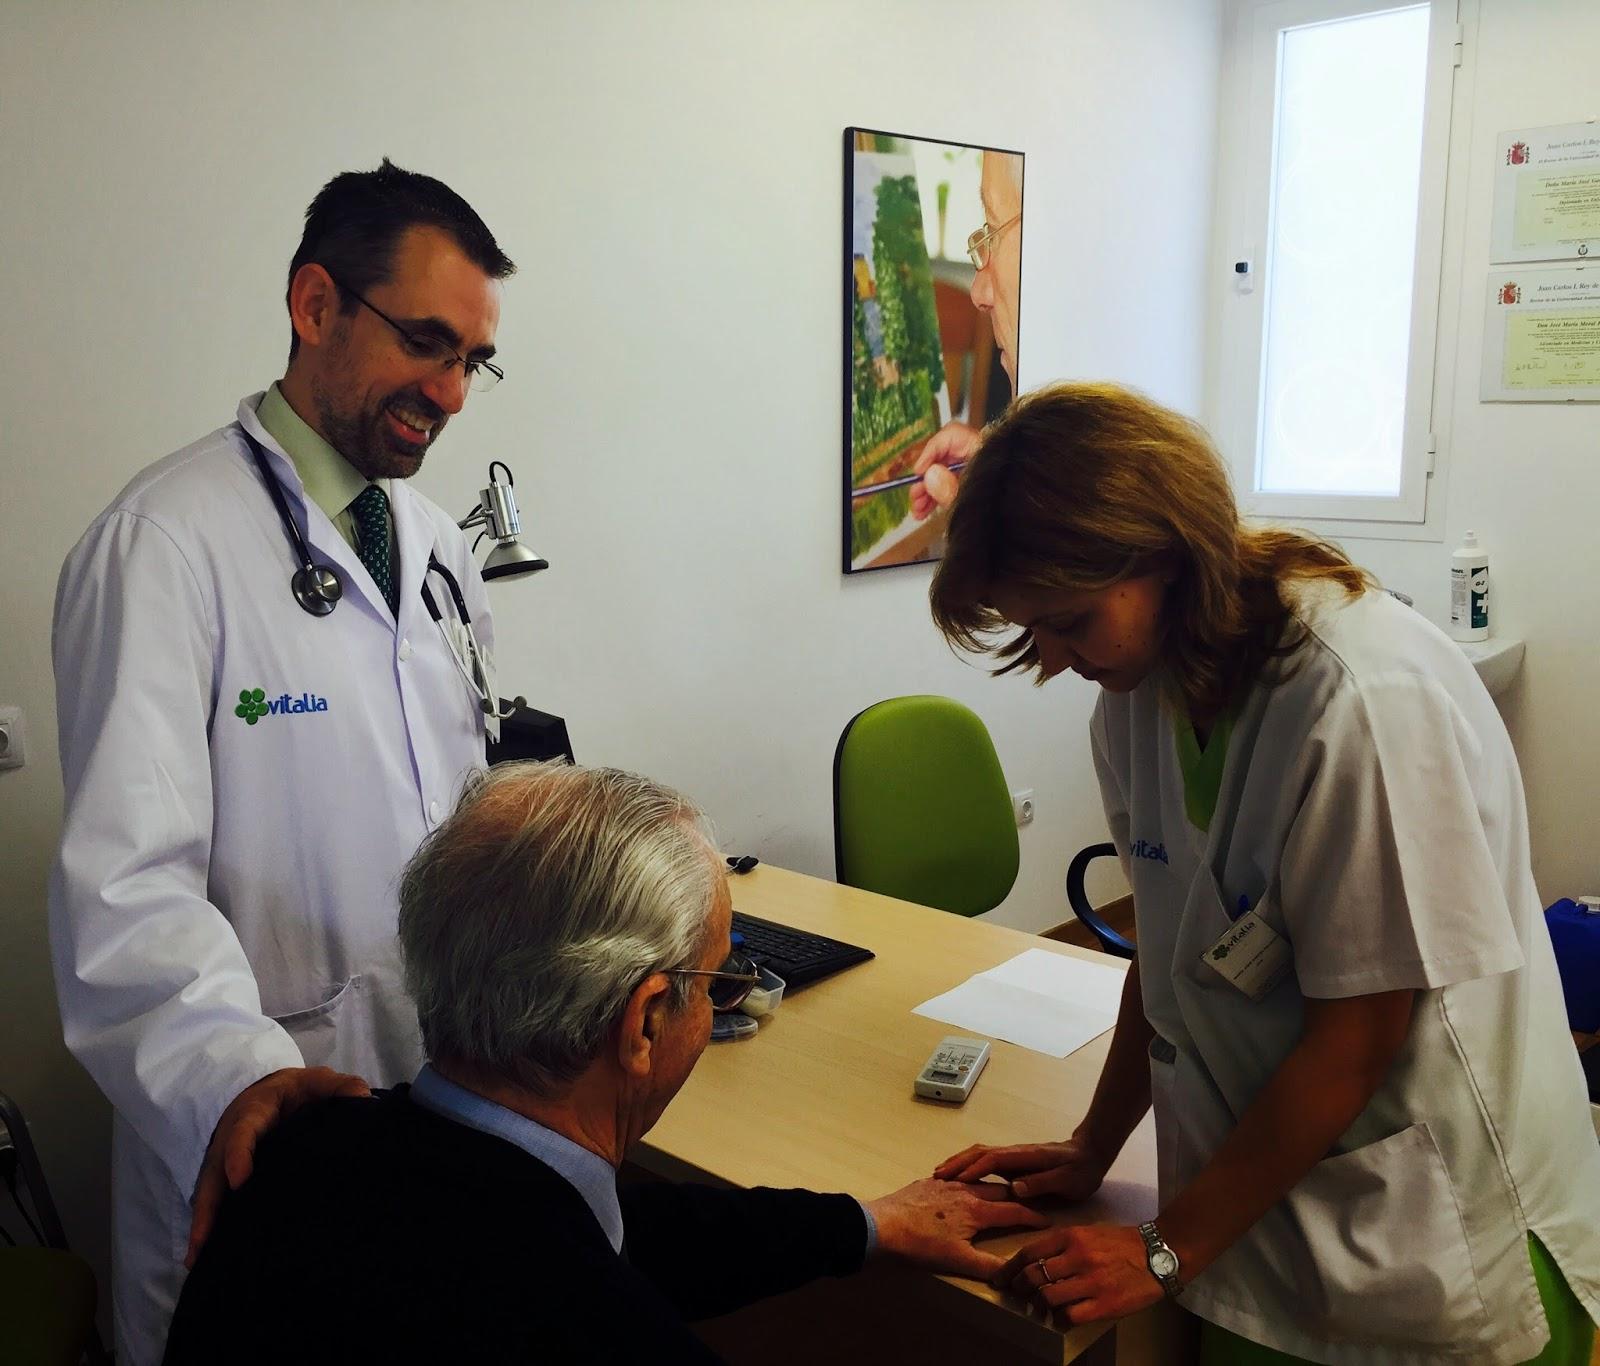 osteoporosis_mayores_vitalia_centro-de-dia-en-alcala-de-henares